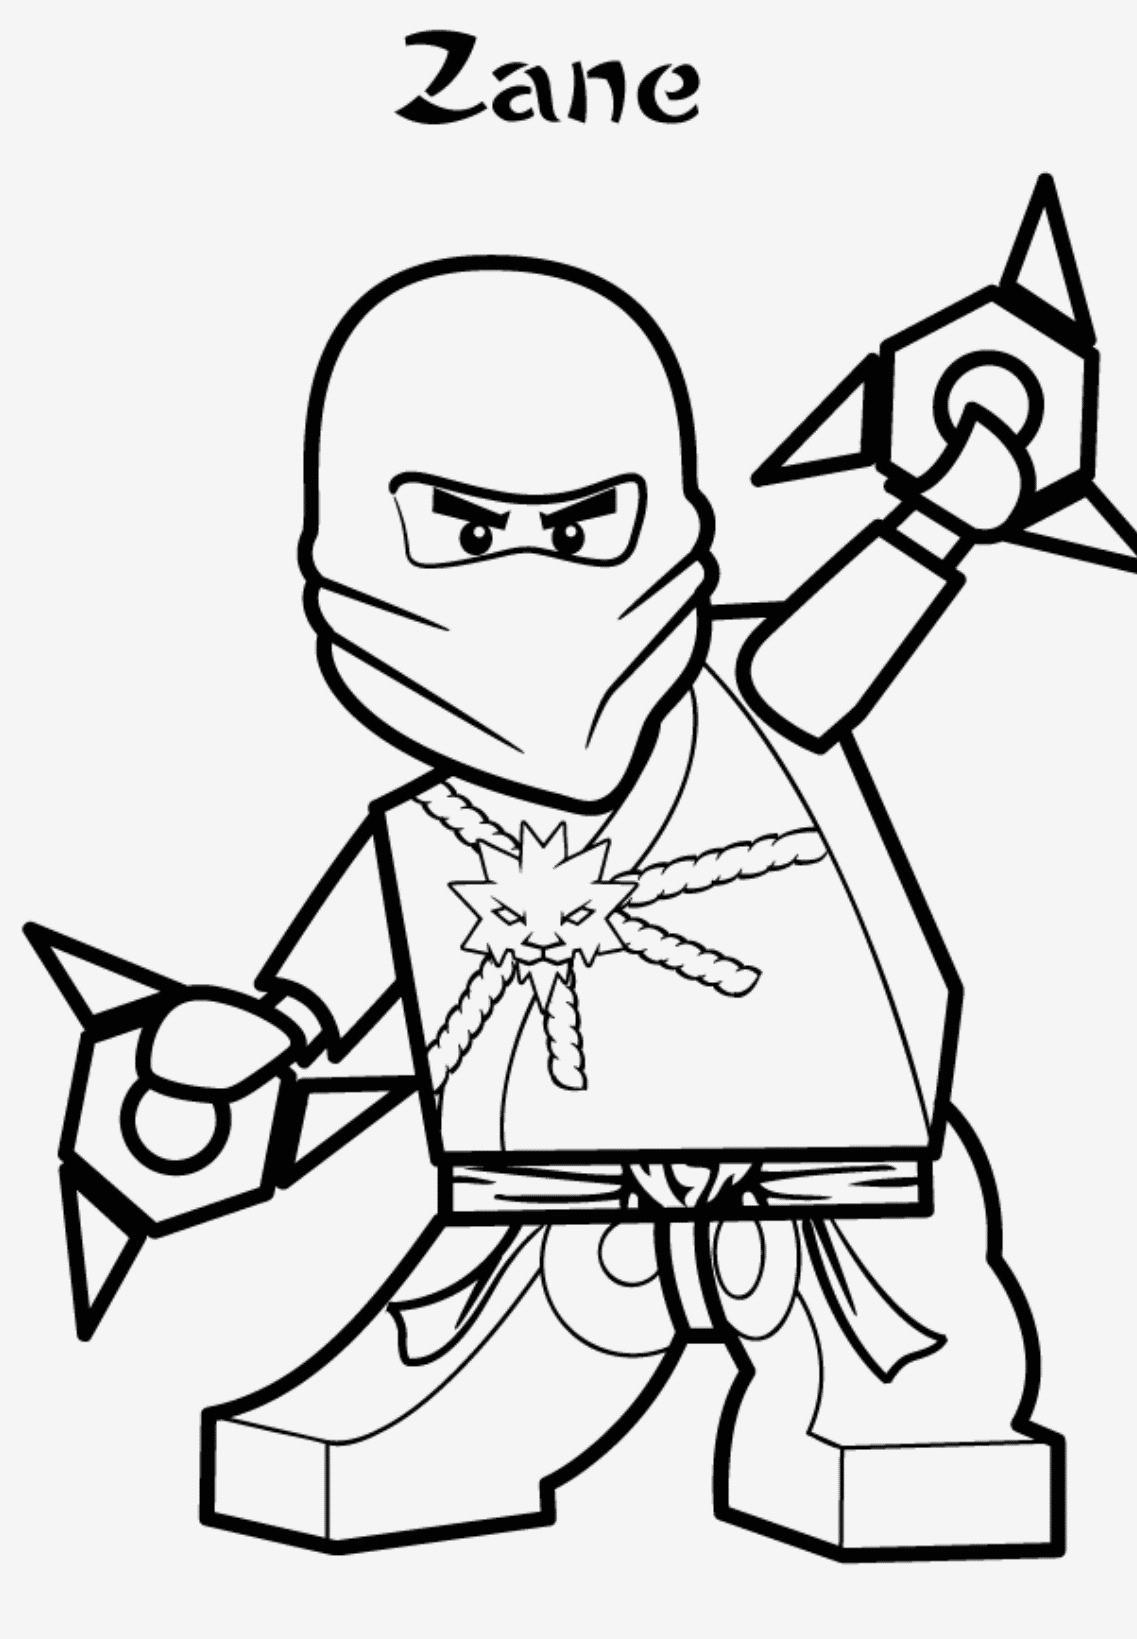 Ninjago Pythor Ausmalbilder Frisch Ninja Ninjago Coloring Pages Lego Ninjago Coloring Sheet Sheets Galerie